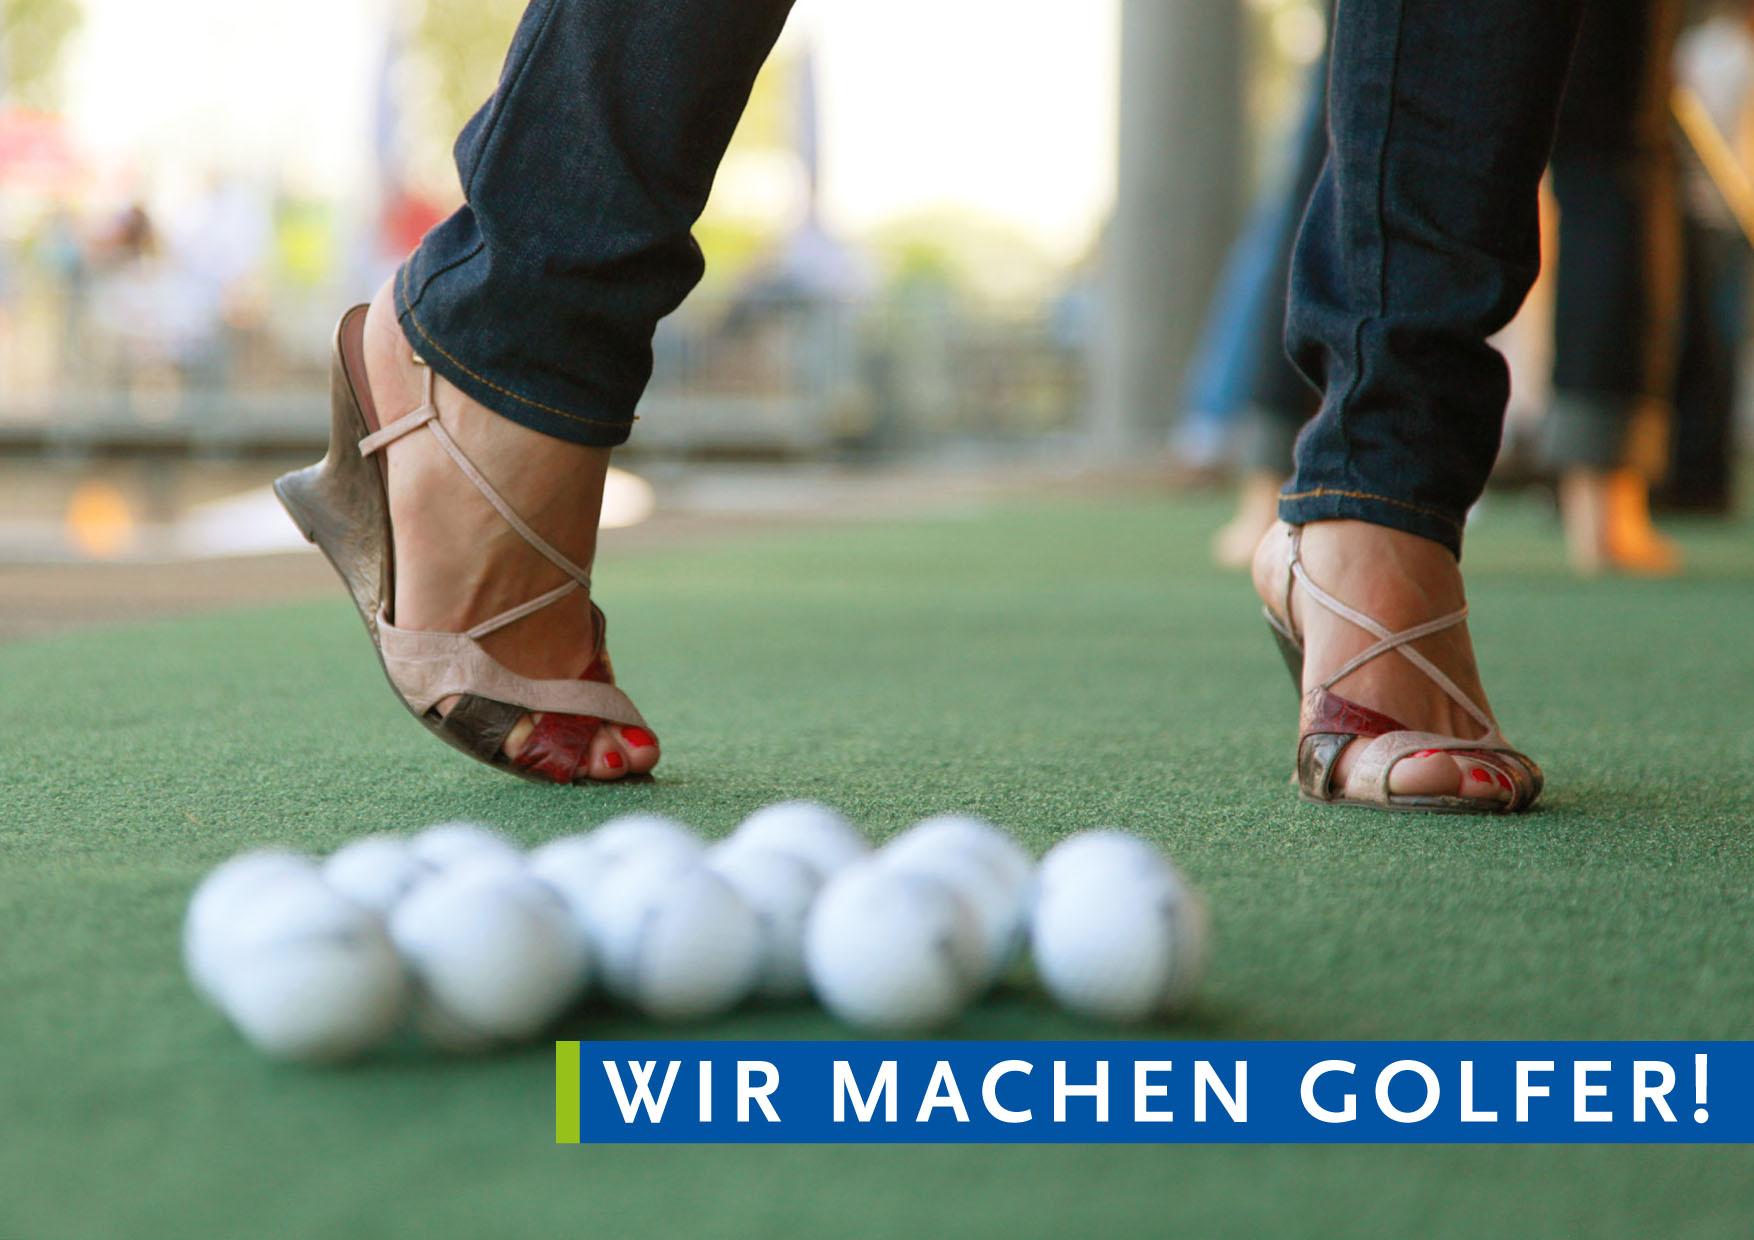 Konservativer Dresscode war gestern. Cool statt spießig heißt es in der Golf Lounge. (Foto: Golf Lounge Hamburg)